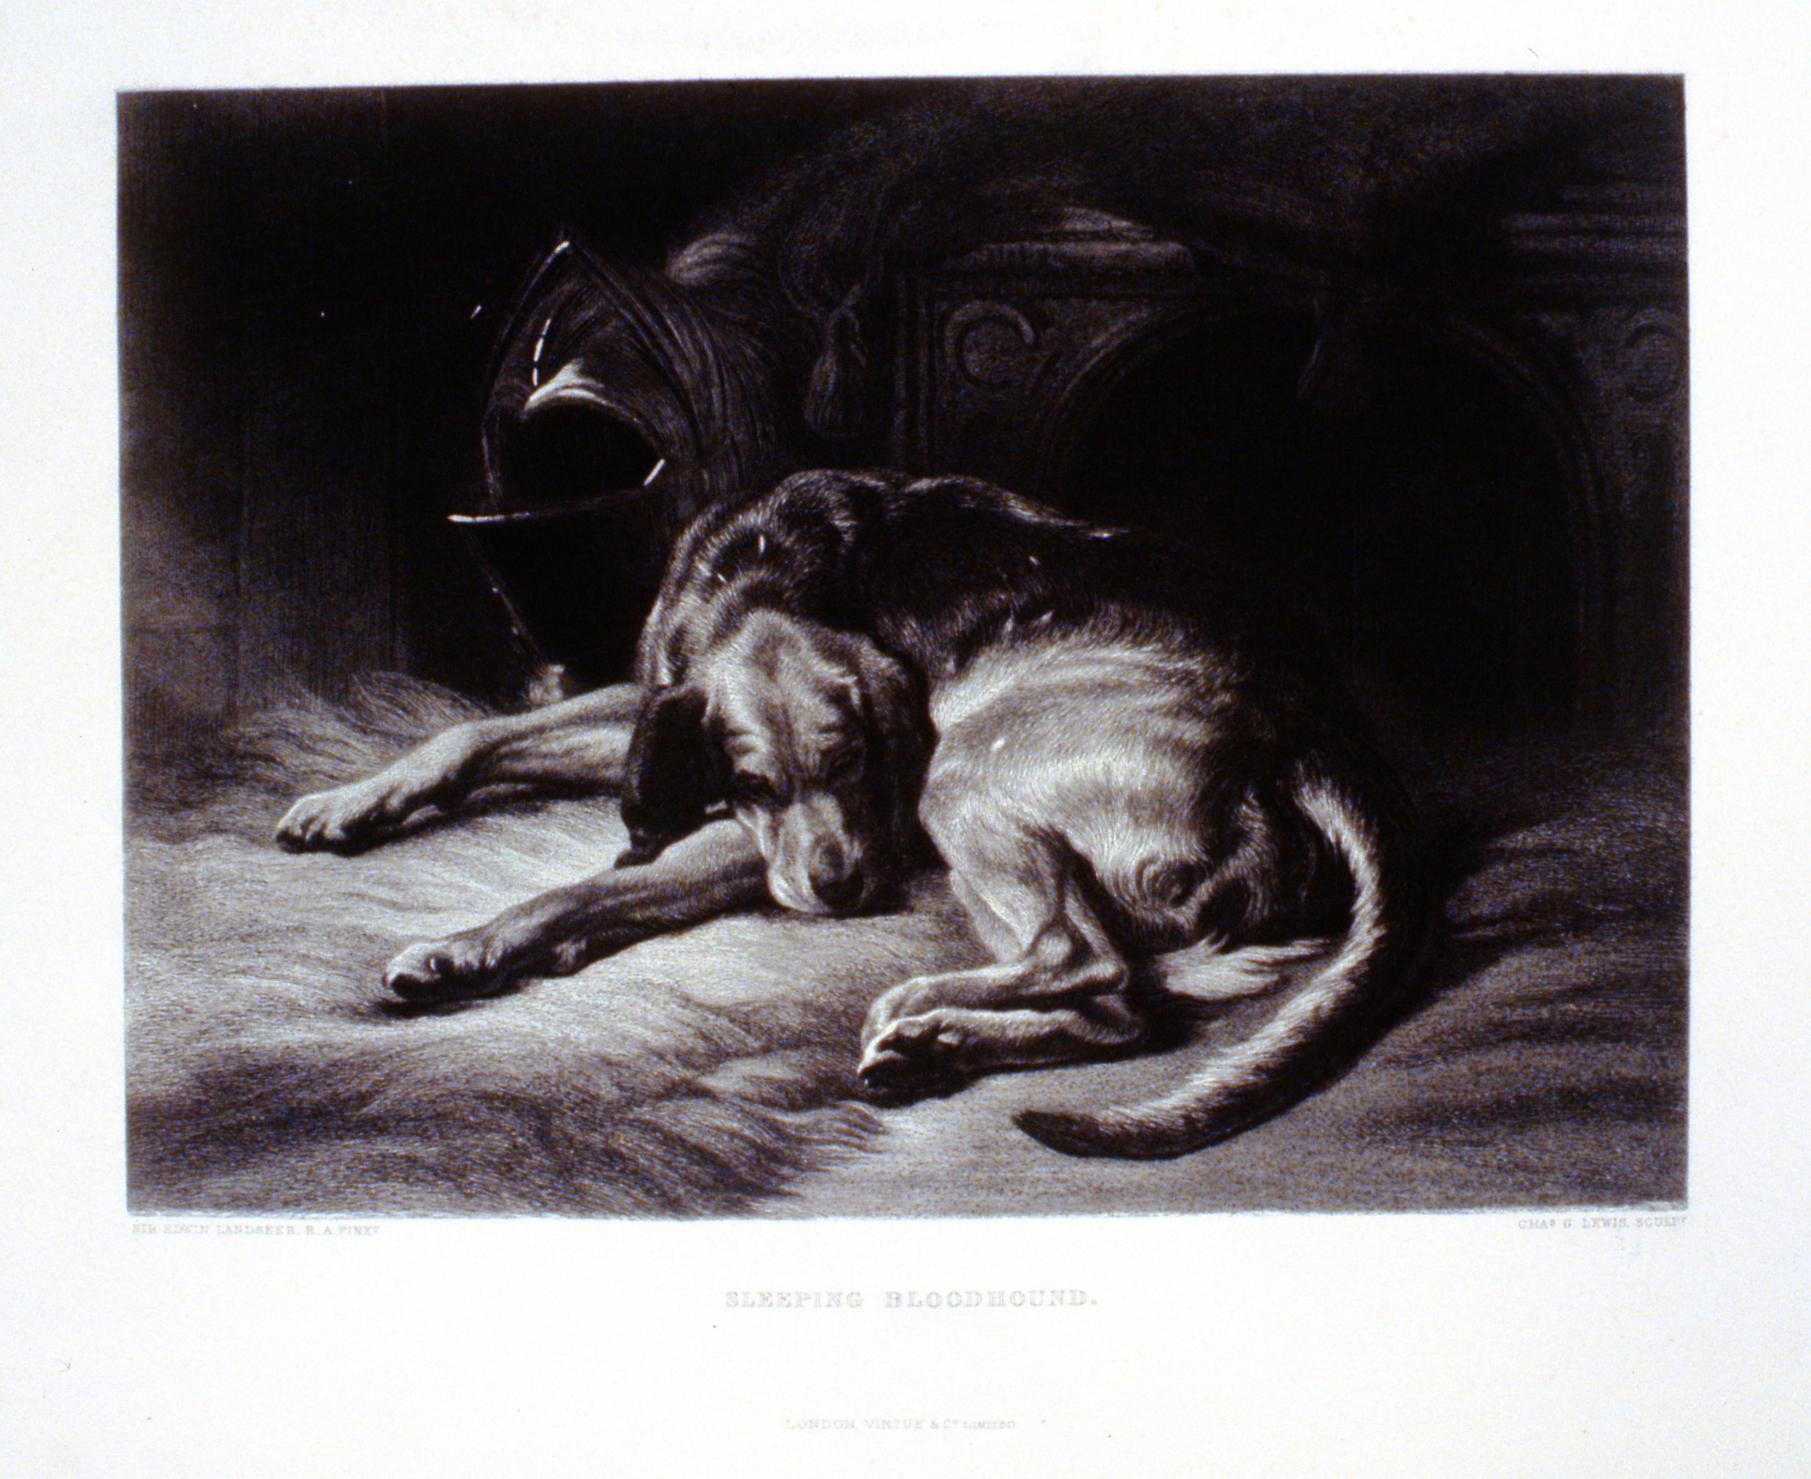 Sleeping Bloodhound , c. late 19th Century, Charles G. Lewis, steel engraving, 19.5 cm x 27 cm, 1996.08.22, gift of Yvonne Adams